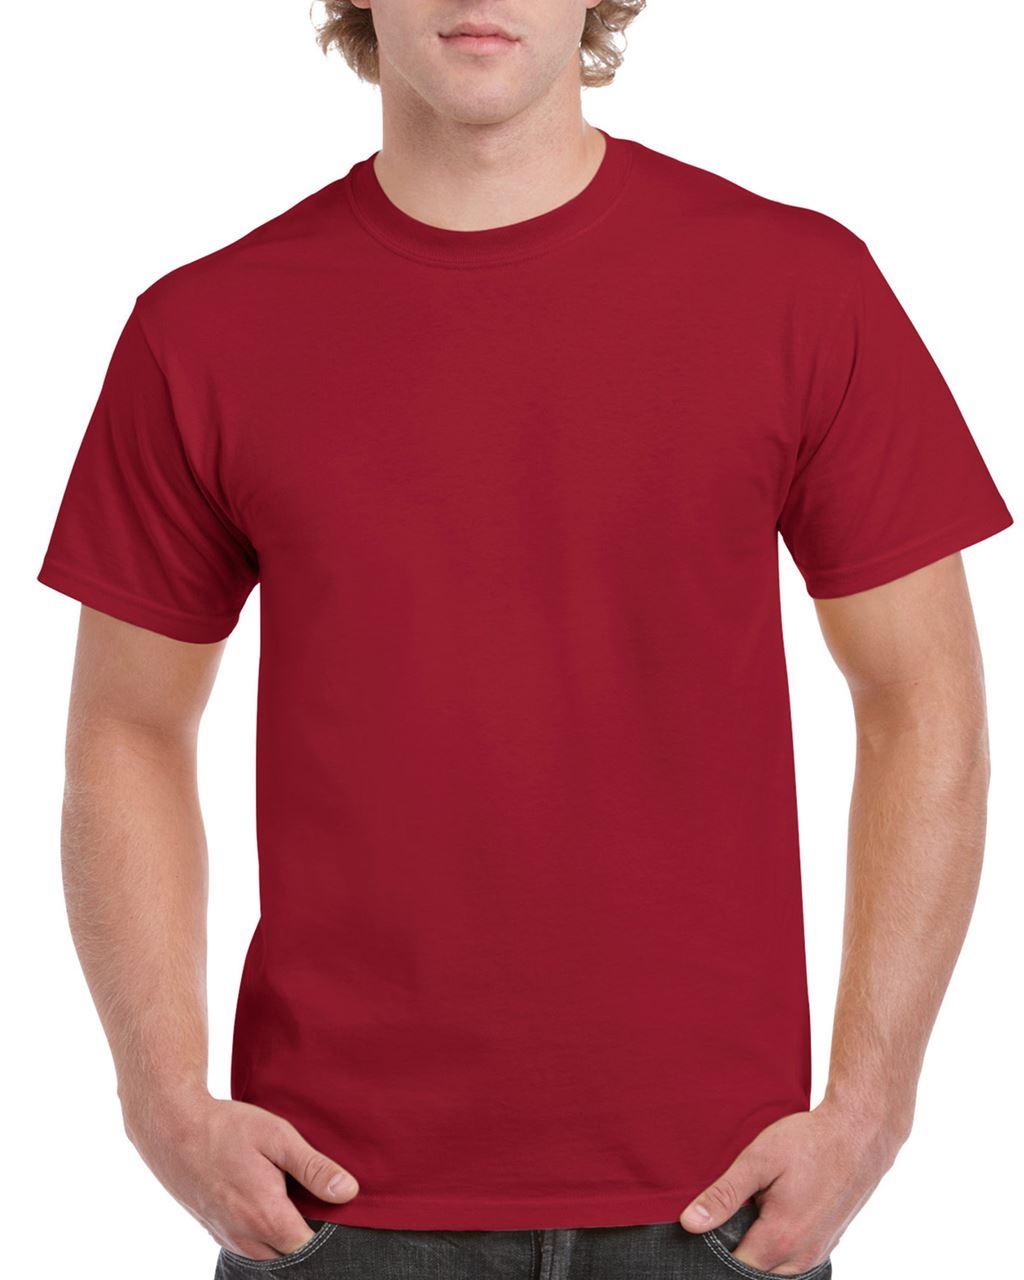 Tricou barbatesc Gildan Ultra Cotton bumbac 203 g/mp serigrafie termotransfer broderie DTG | Toroadv.ro